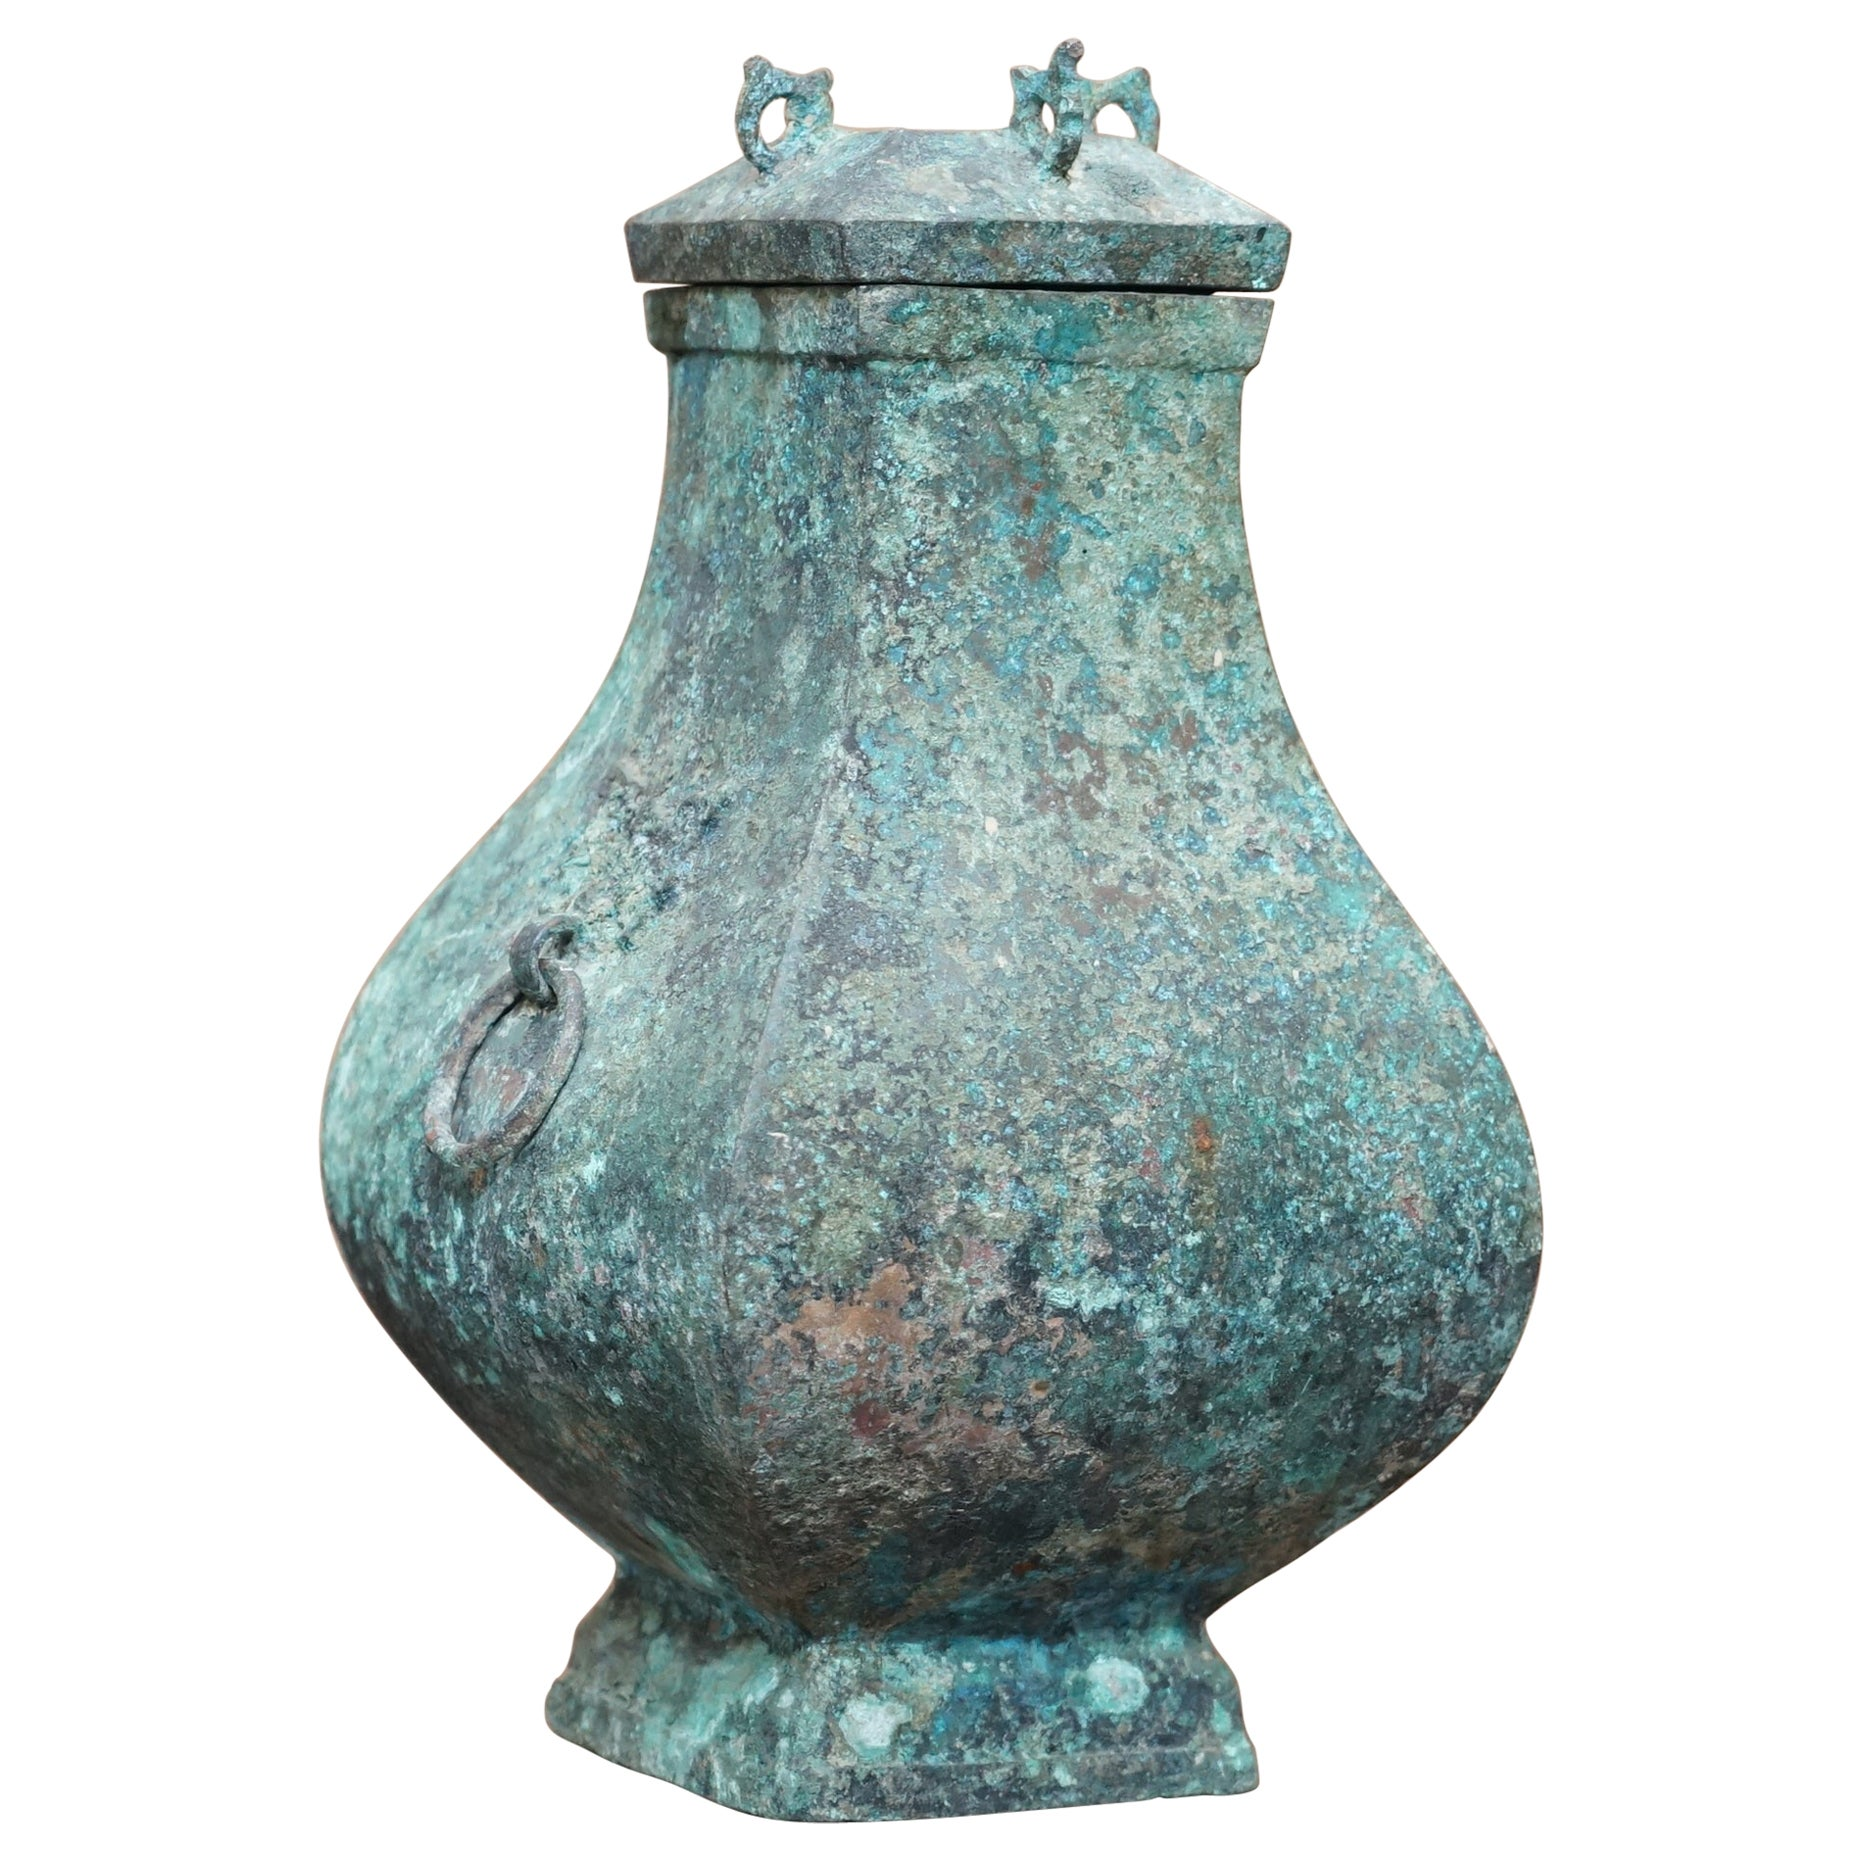 Fanghu Han Dynasty 206BC-220AD Chinese Bronze Ritual Wine Vessel Jug & Cover